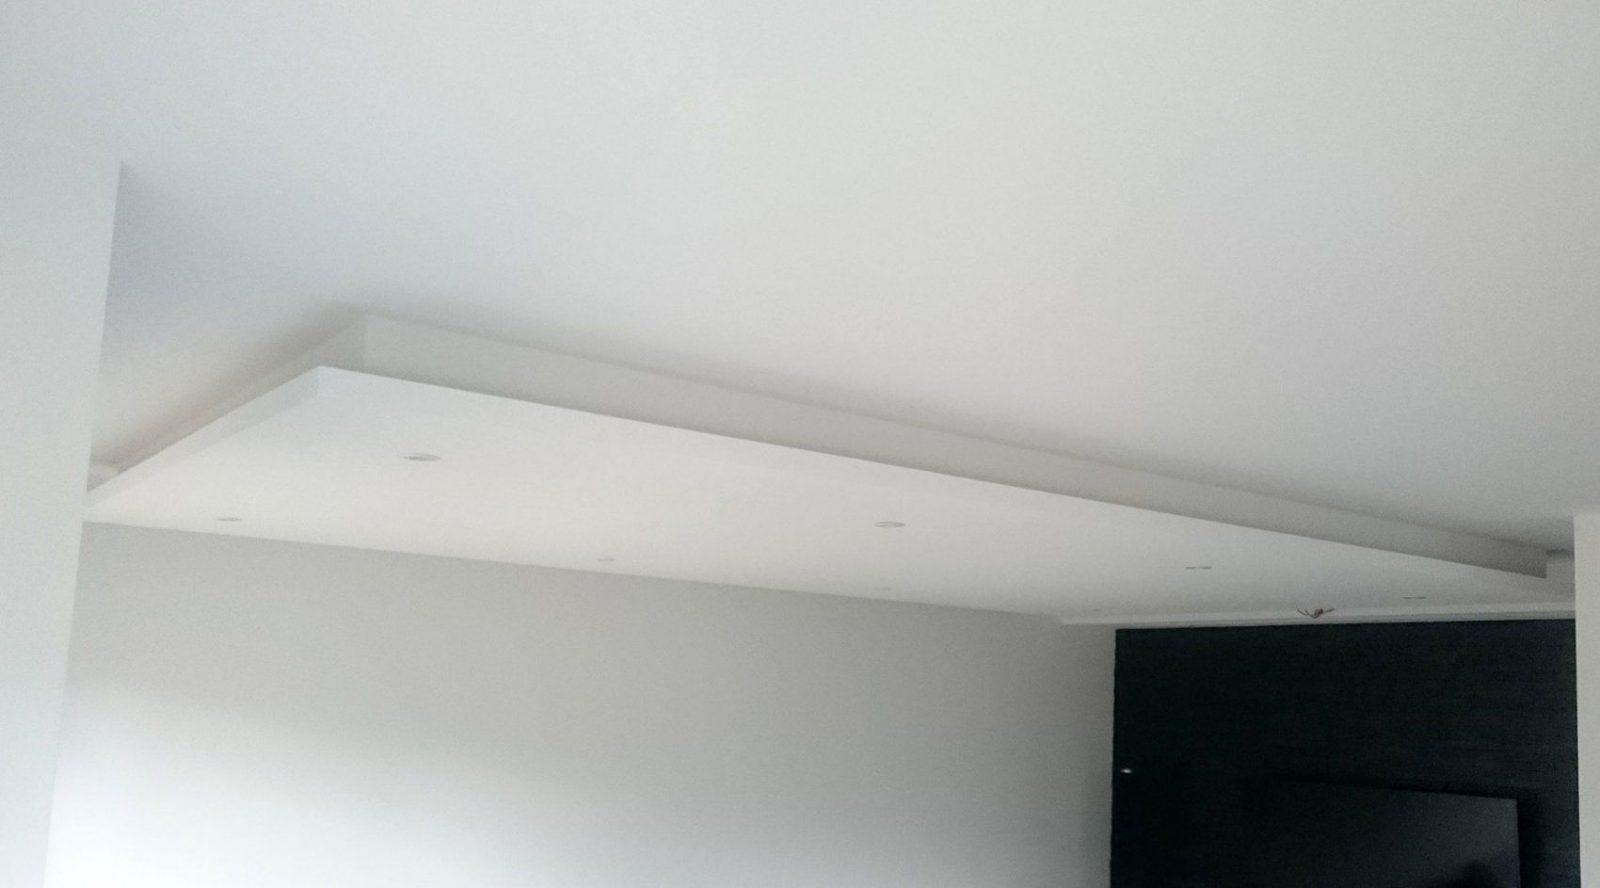 indirekte beleuchtung selber bauen rigips haus design ideen. Black Bedroom Furniture Sets. Home Design Ideas